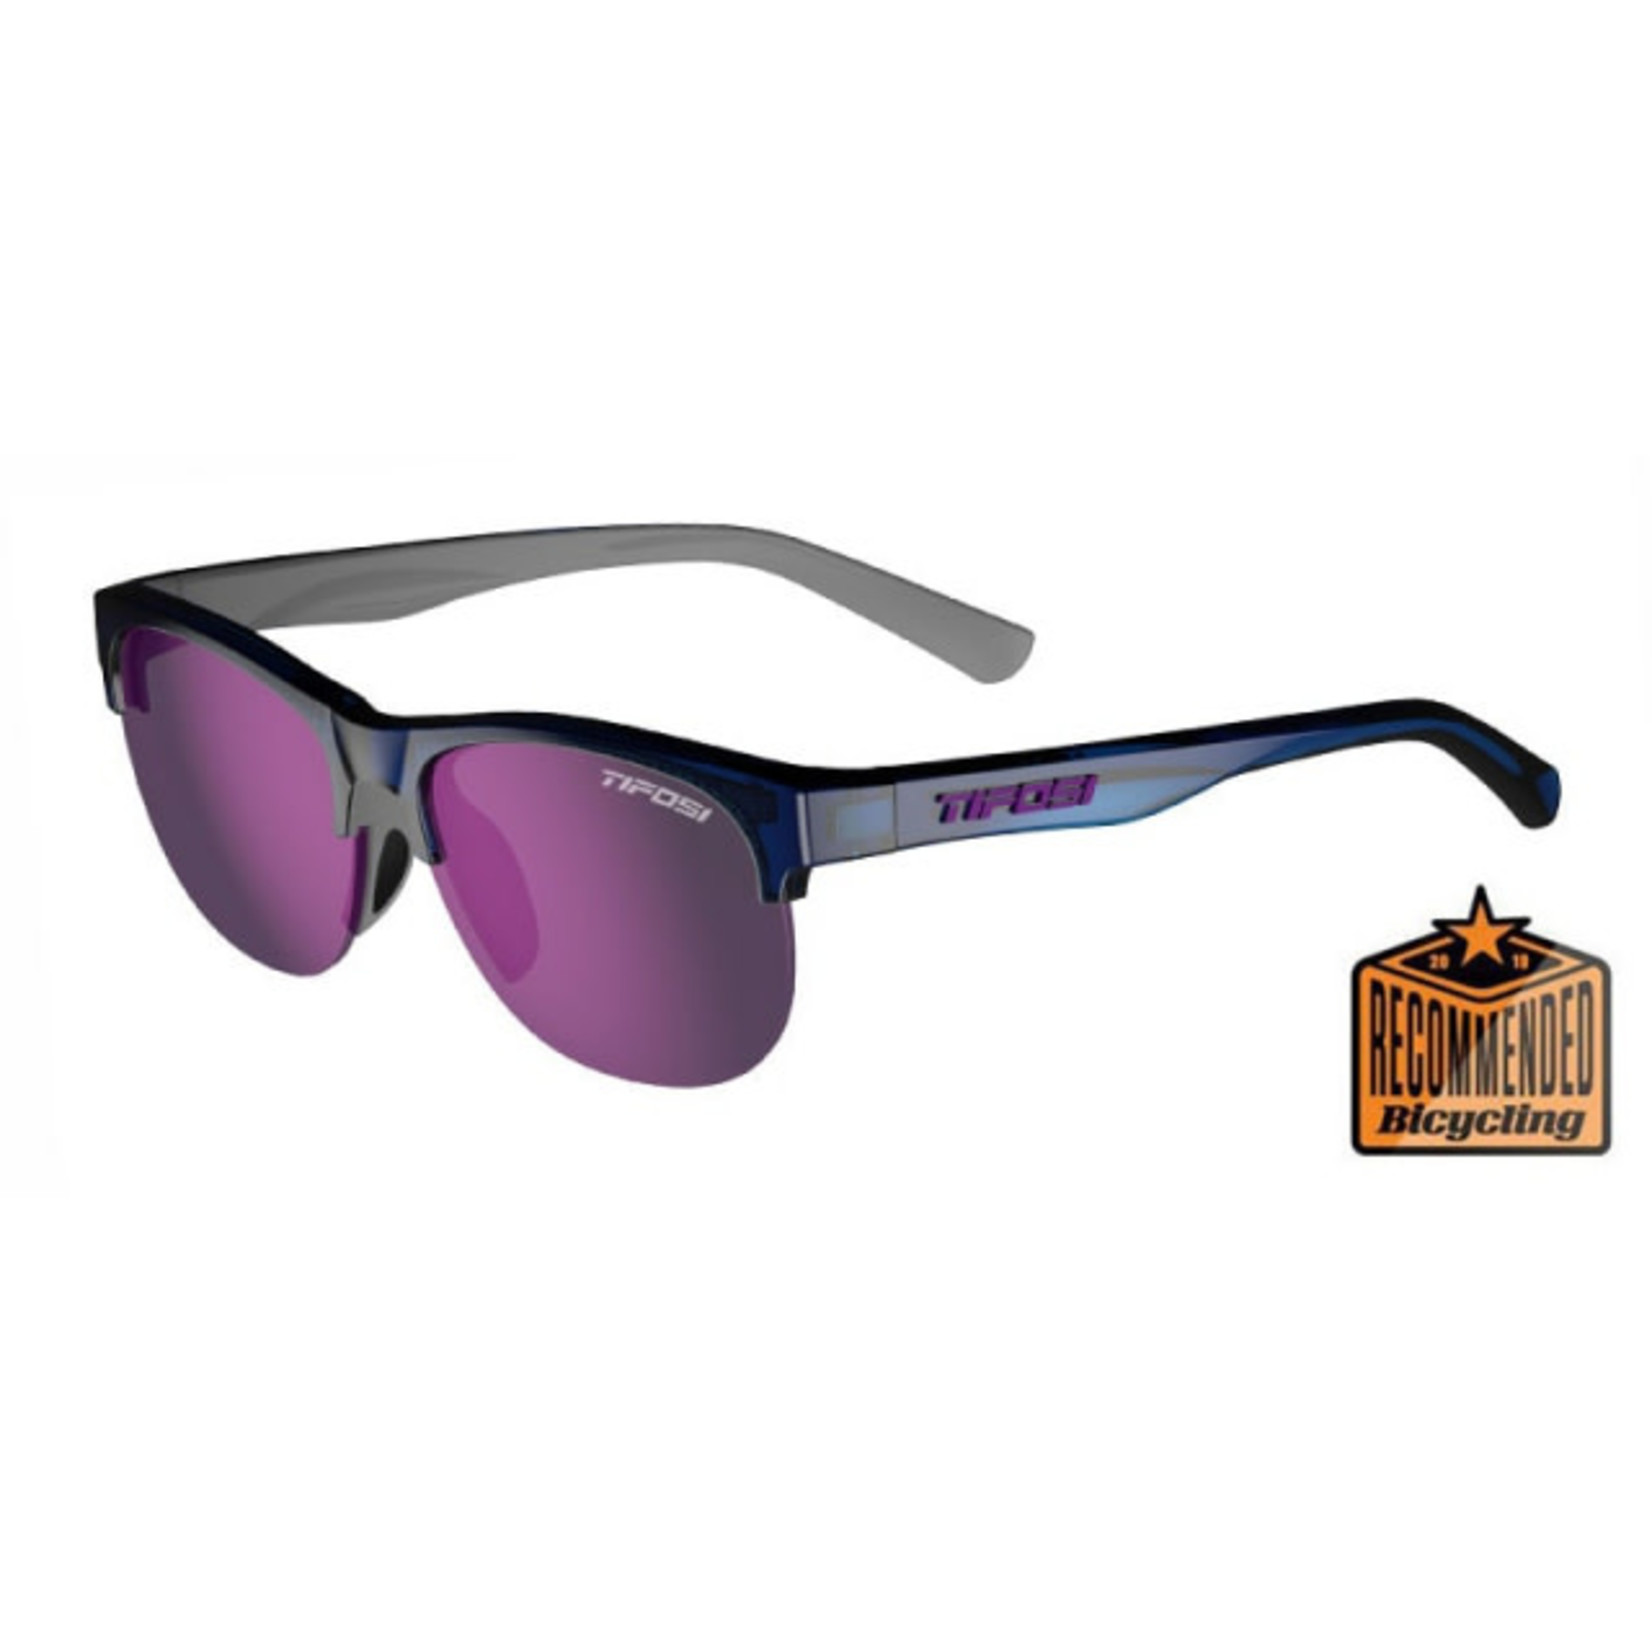 Tifosi Optics Swank SL, Indigo Shine Single Lens Sunglasses